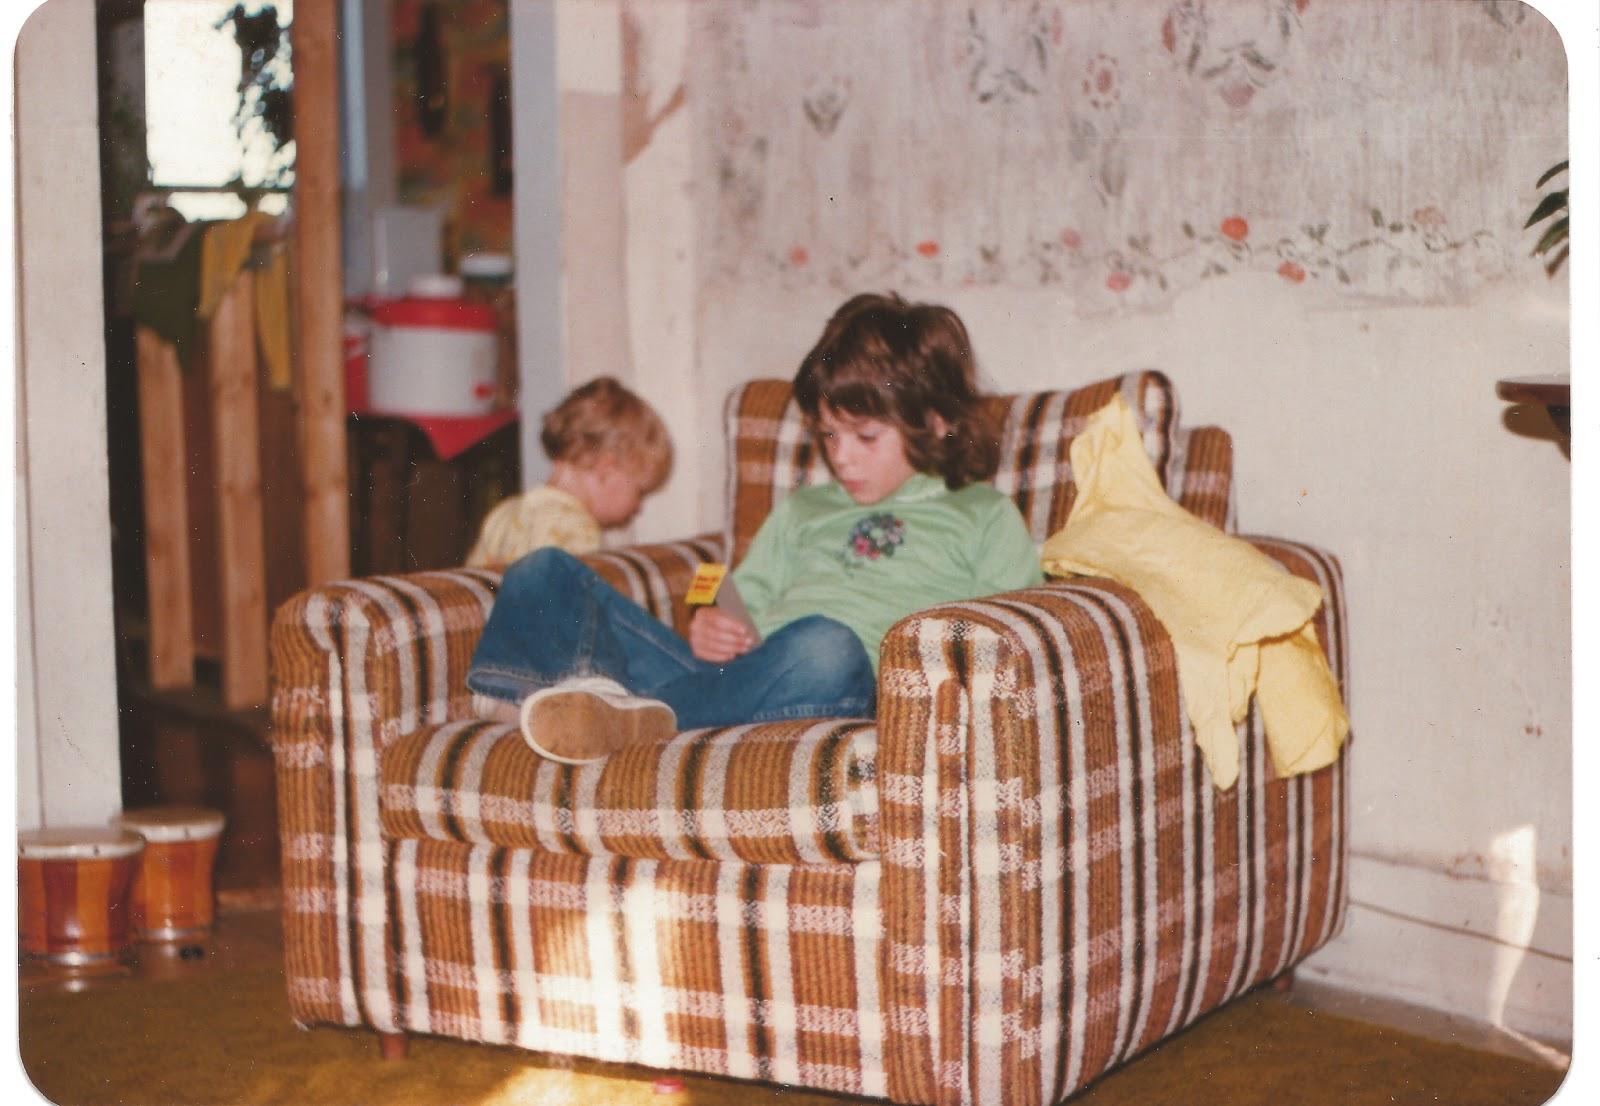 My brother and I circa 1976 © Diana Sherblom